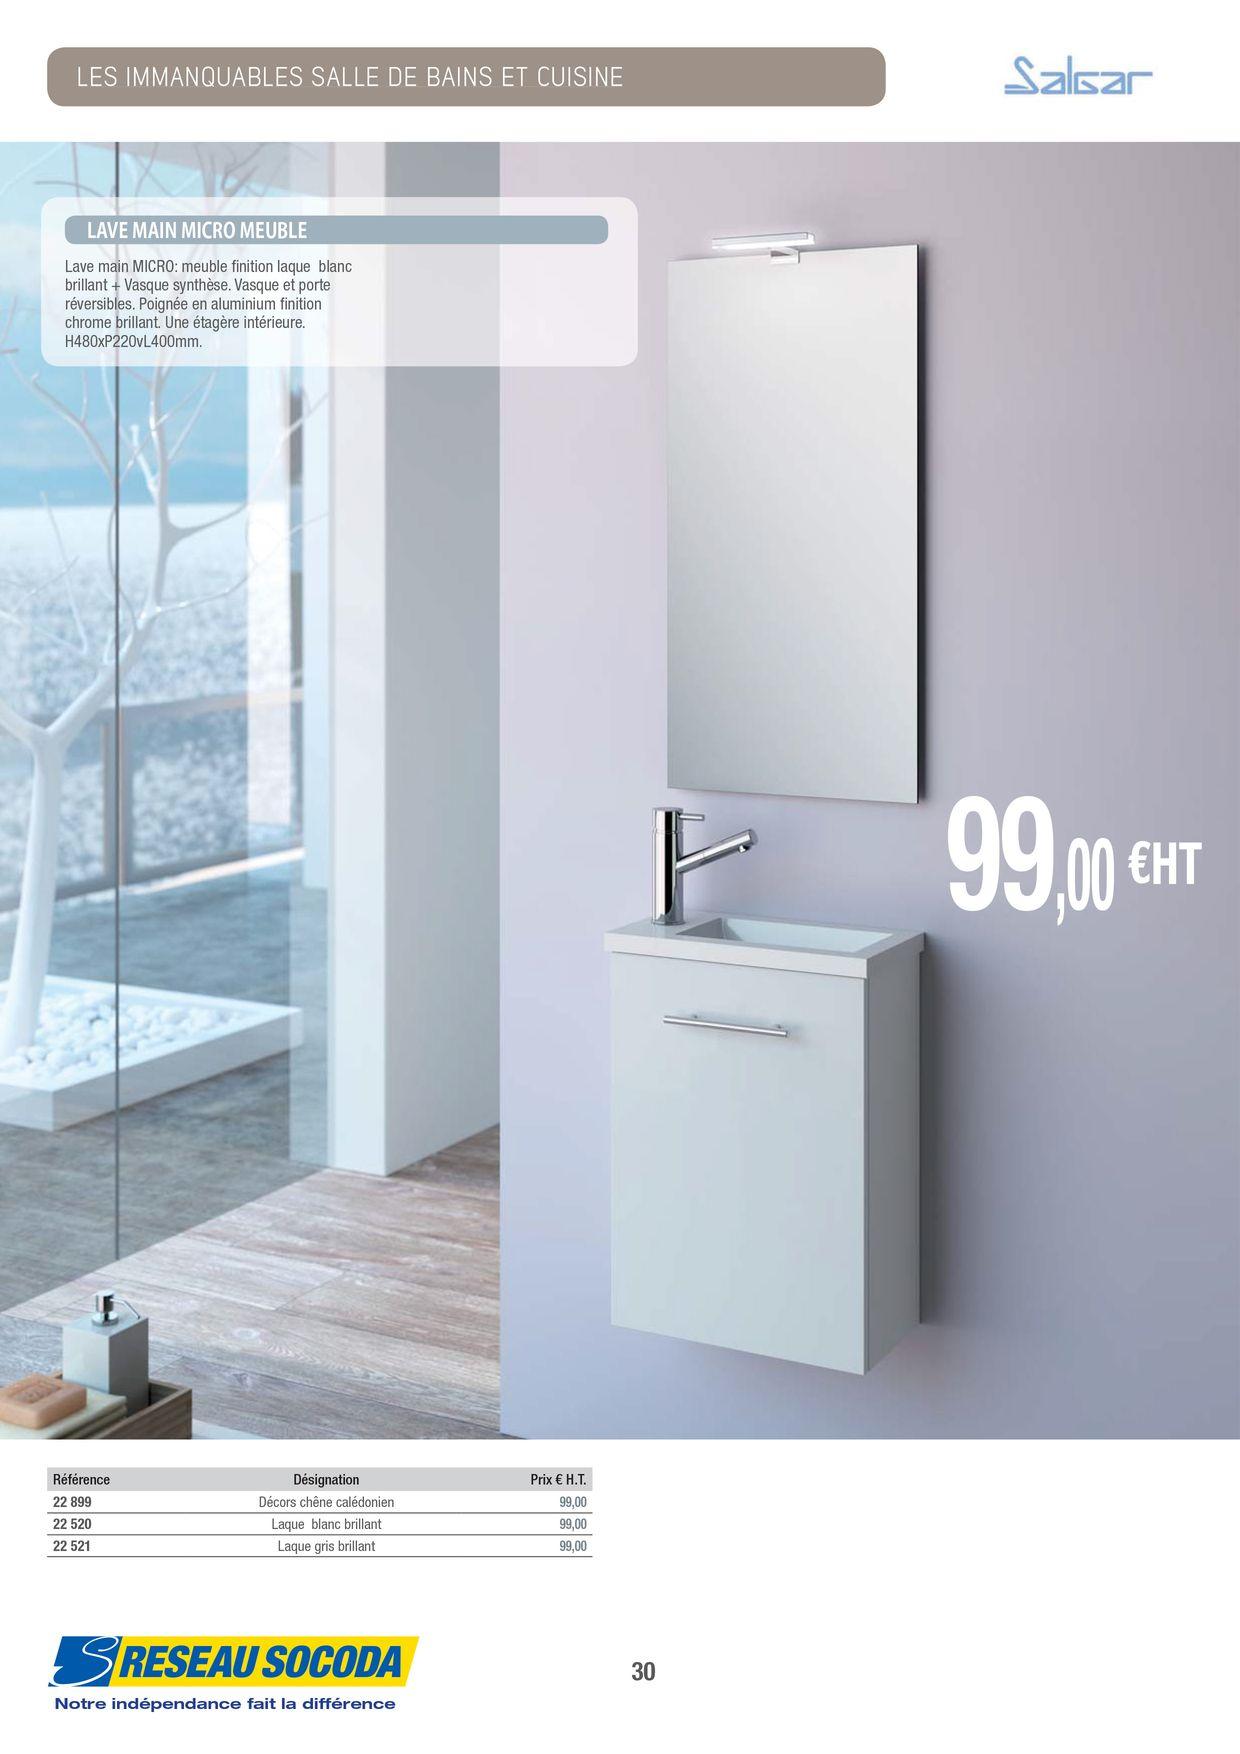 Difference Blanc Brillant Et Blanc Laqué socoda - socoda -les immanquables salle de bains cuisine